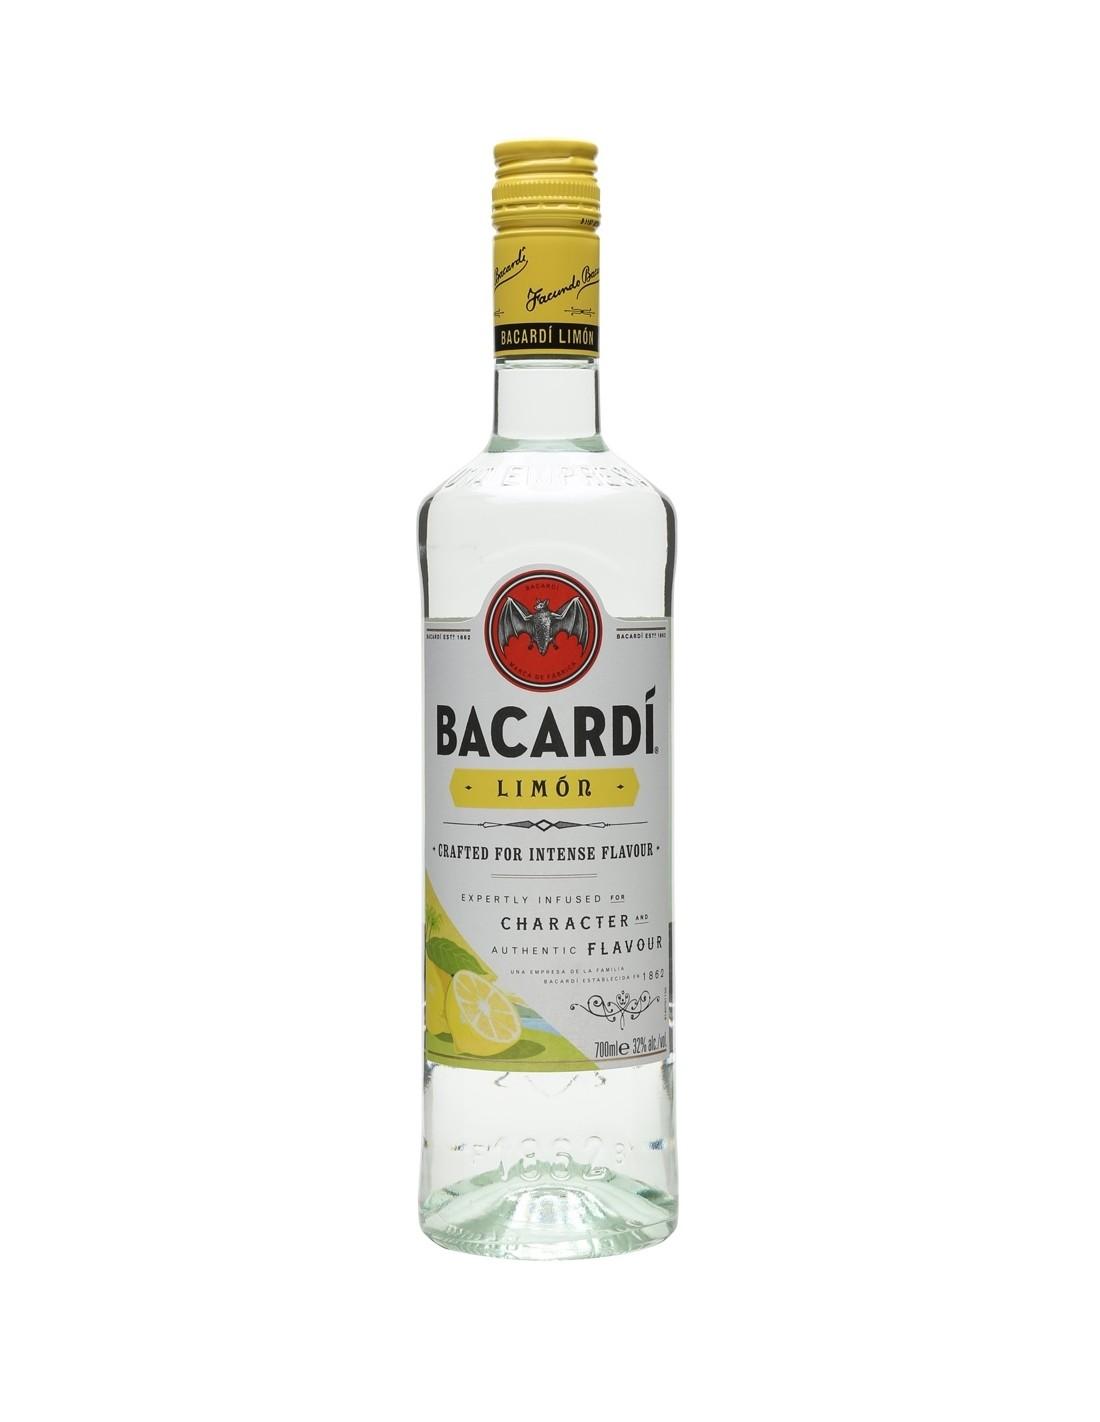 Rom alb Bacardi Limon, 0.7L, 32% alc., Cuba